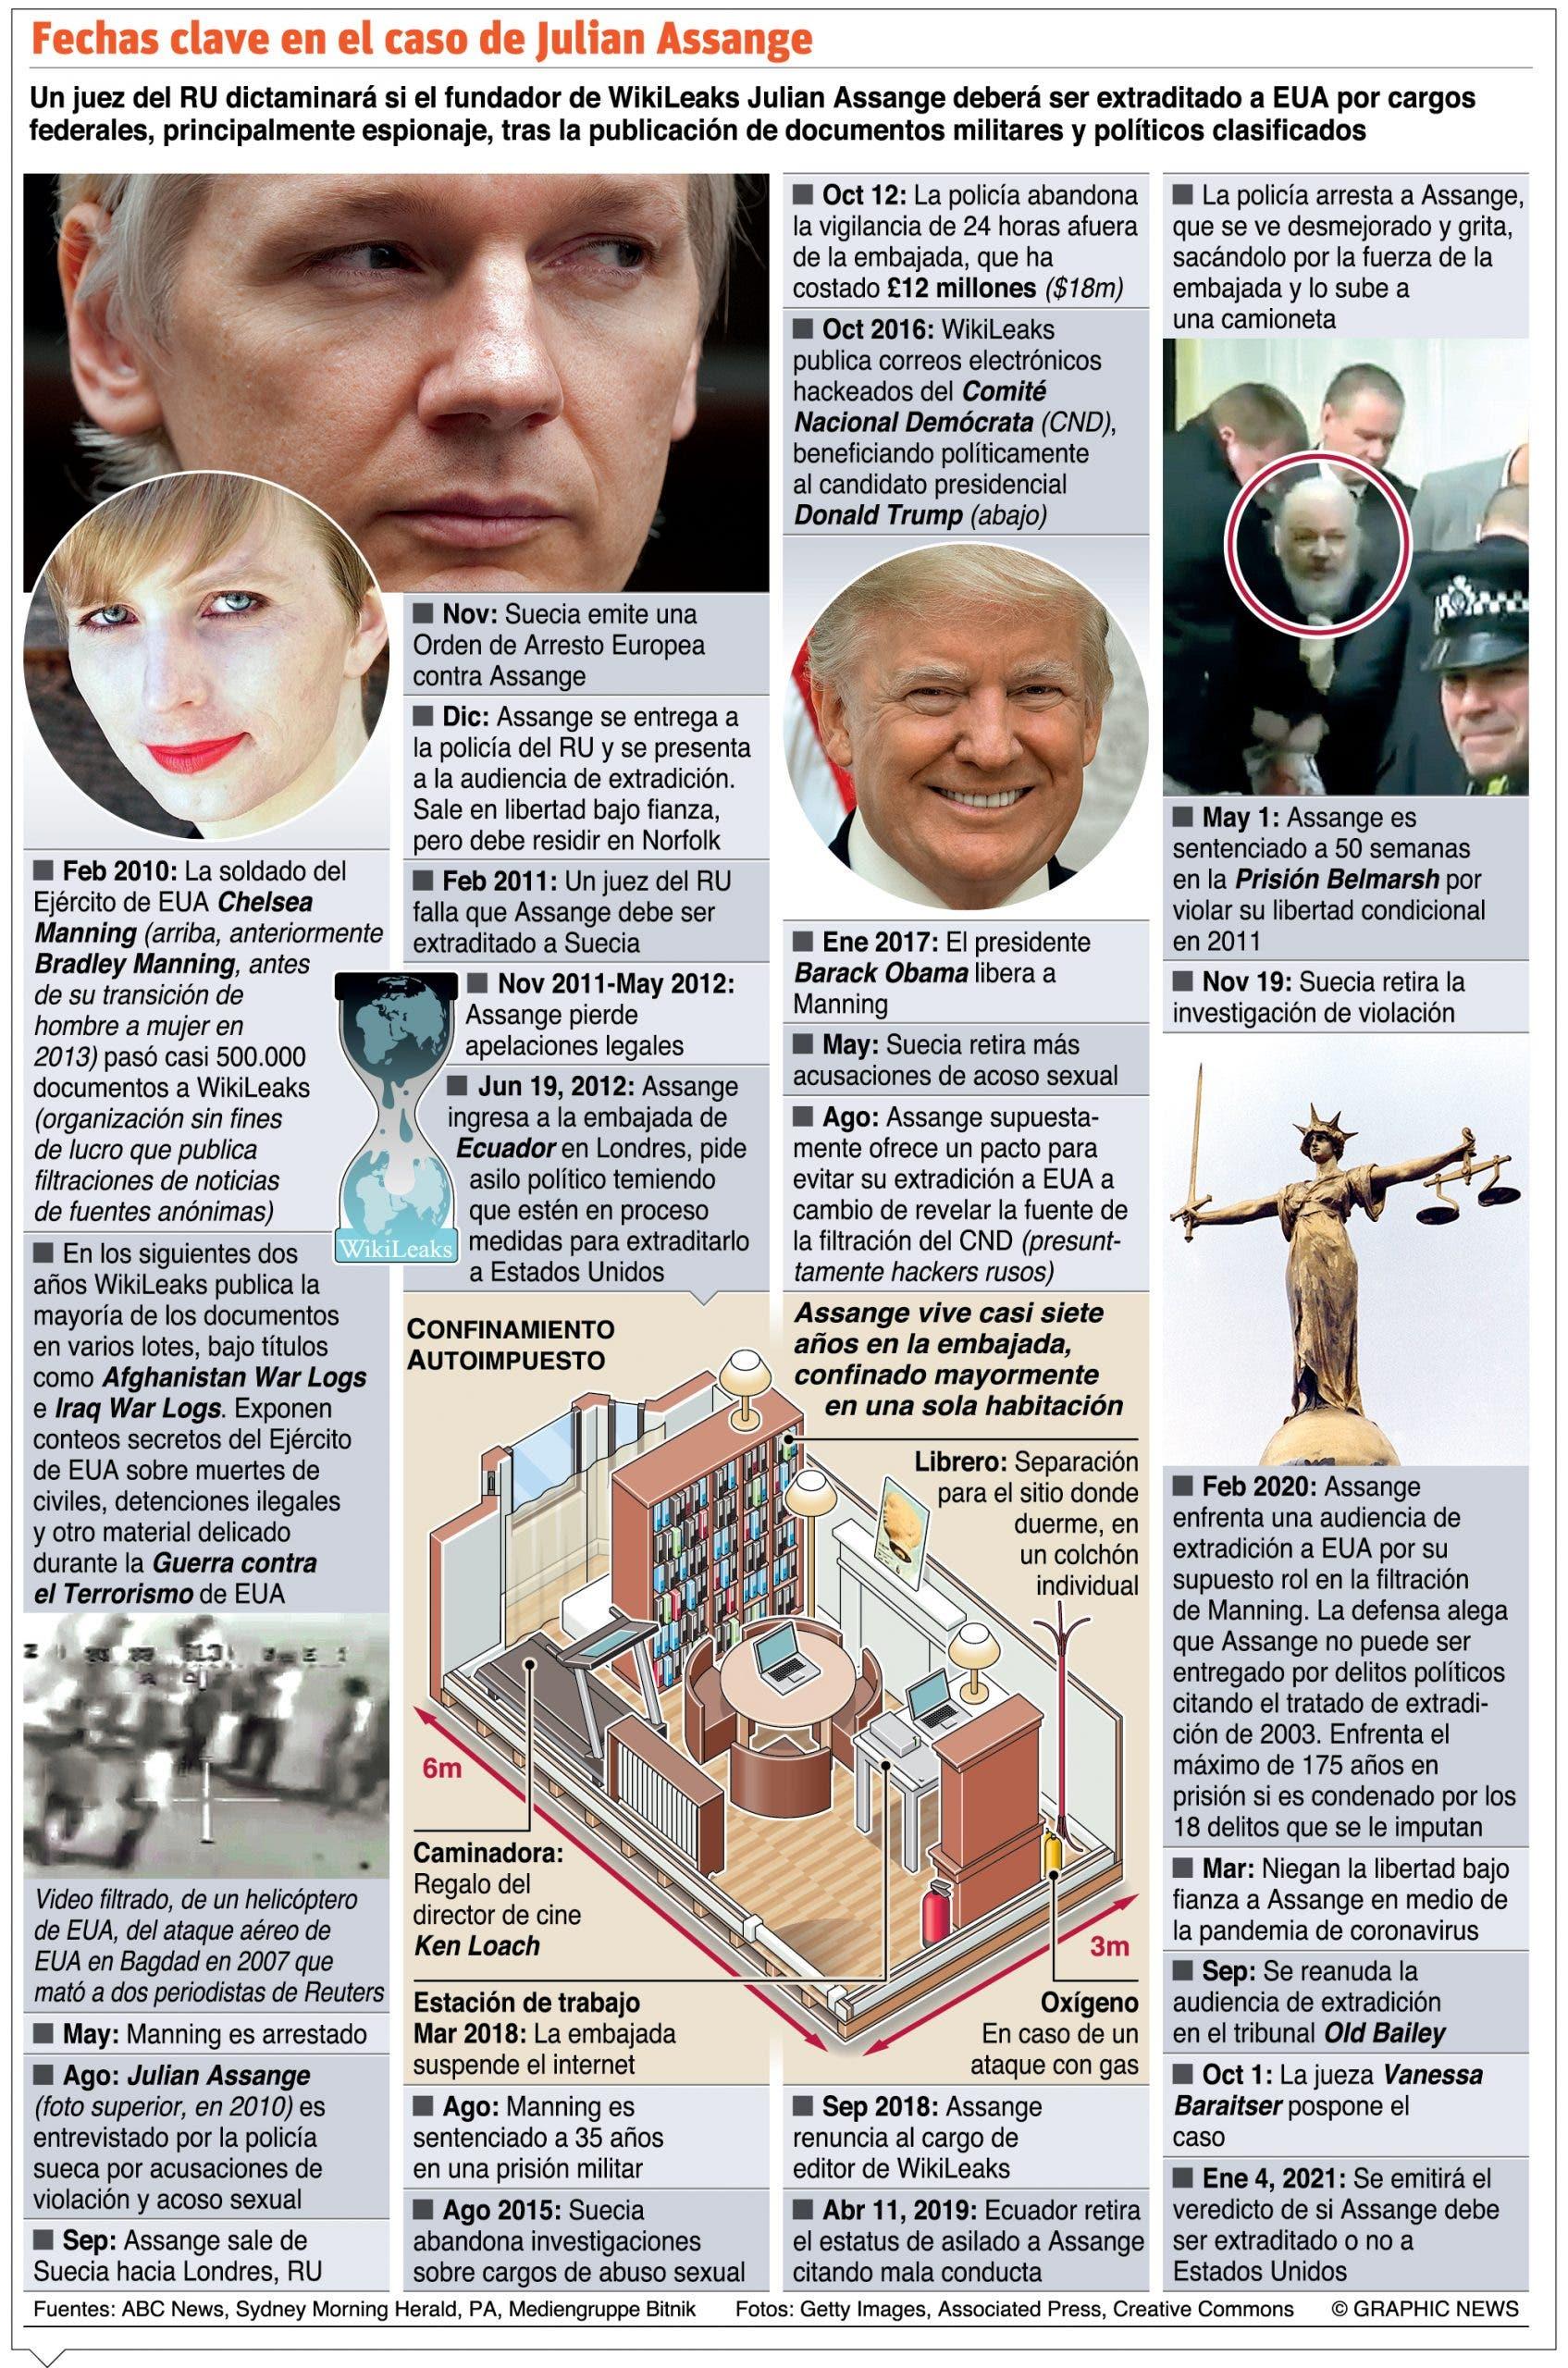 El mundo atento a extradición de Assange a Estados Unidos